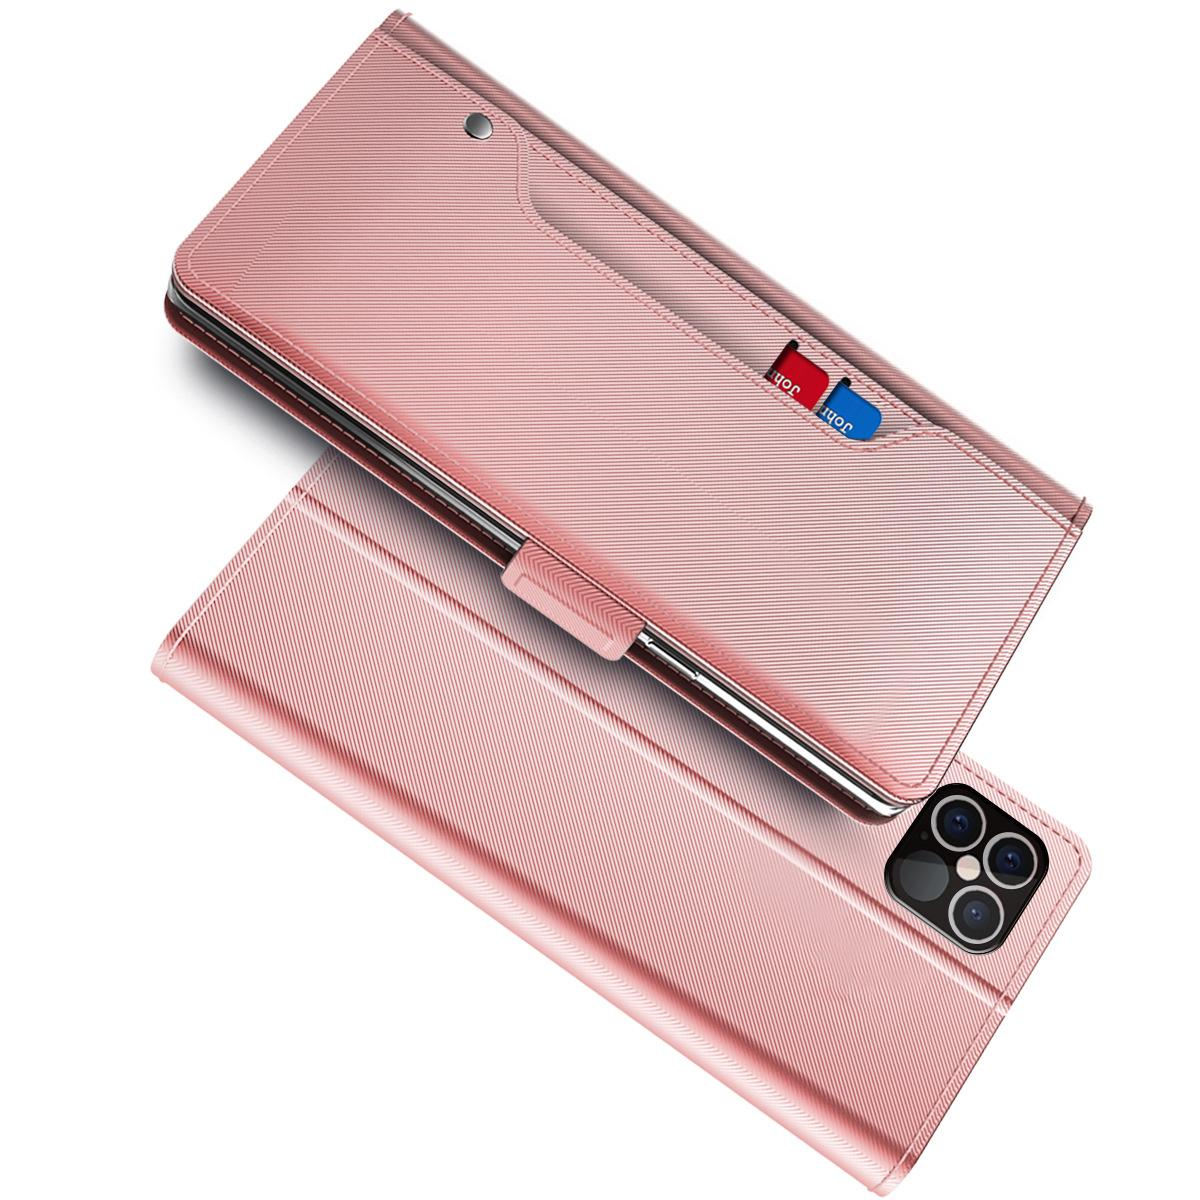 Lommebokdeksel Speil iPhone 12 Pro Max Rosa Gull